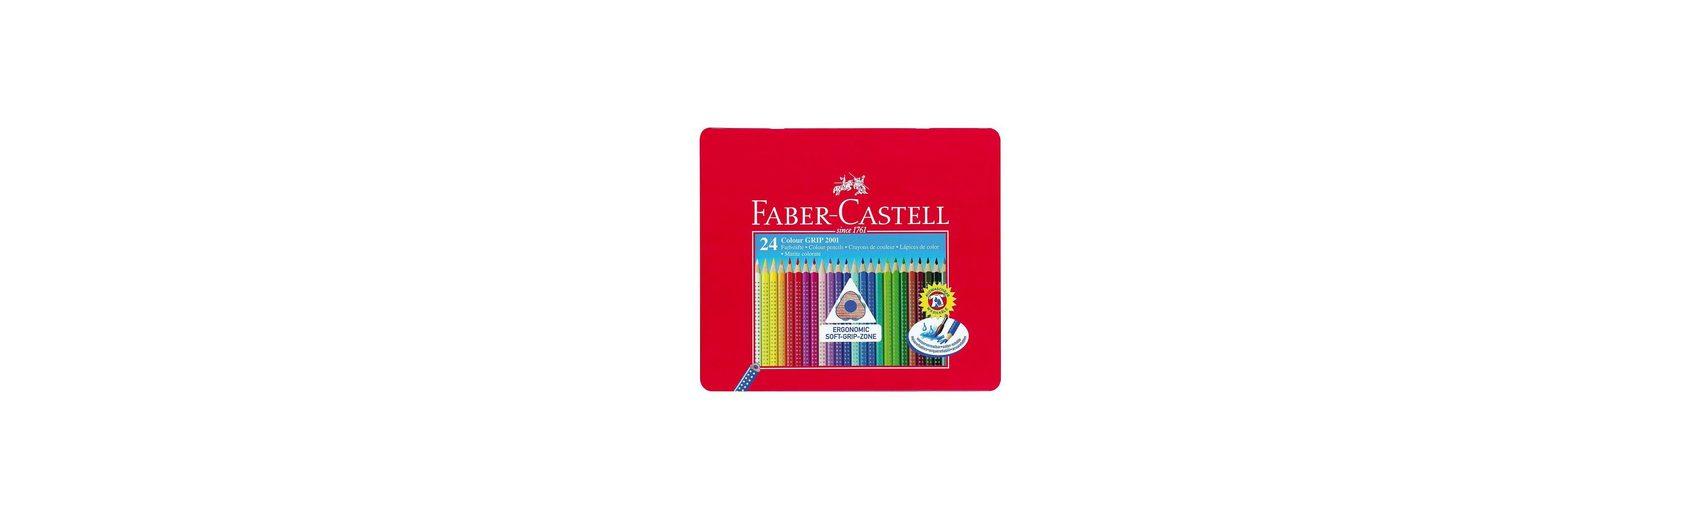 Faber-Castell COLOUR GRIP Farbstifte wasservermalbar, 24 Farben, Metalletu